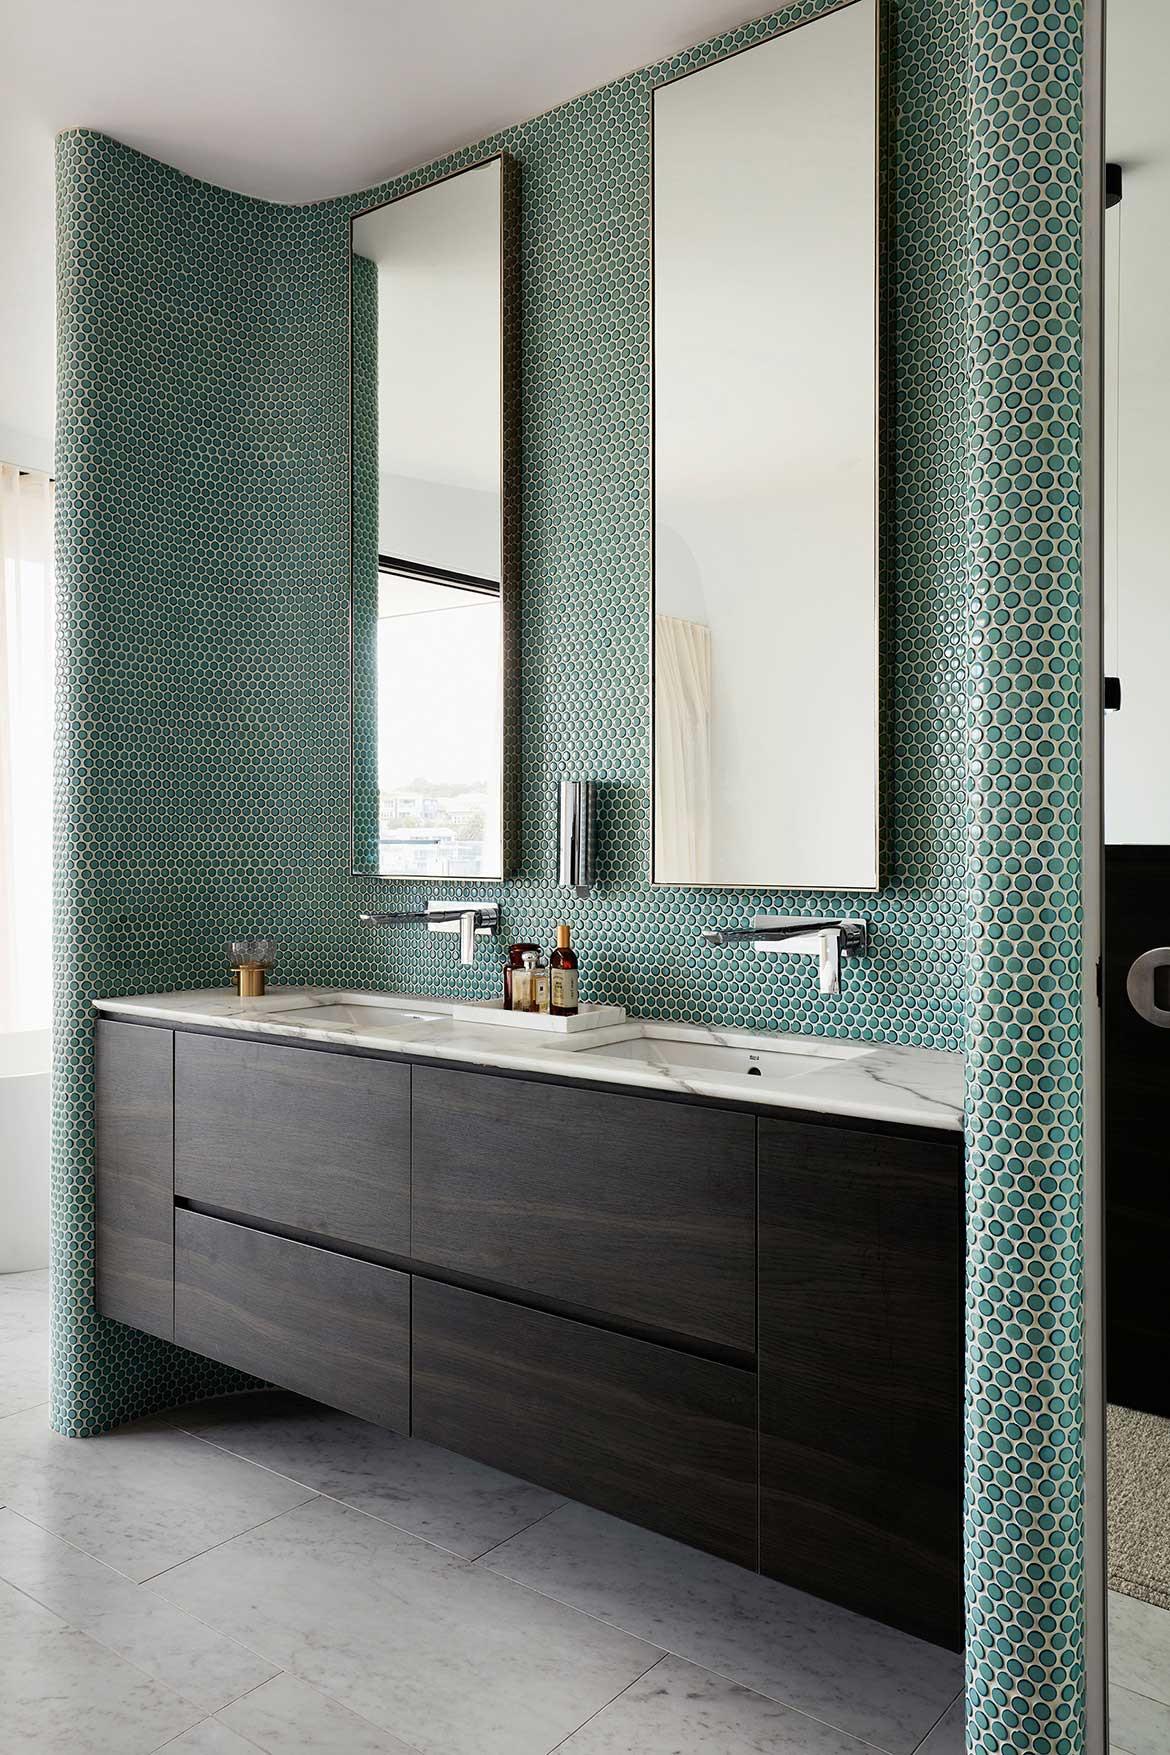 Tamas Tee House Luigi Rosselli Architects bathroom green mosaic